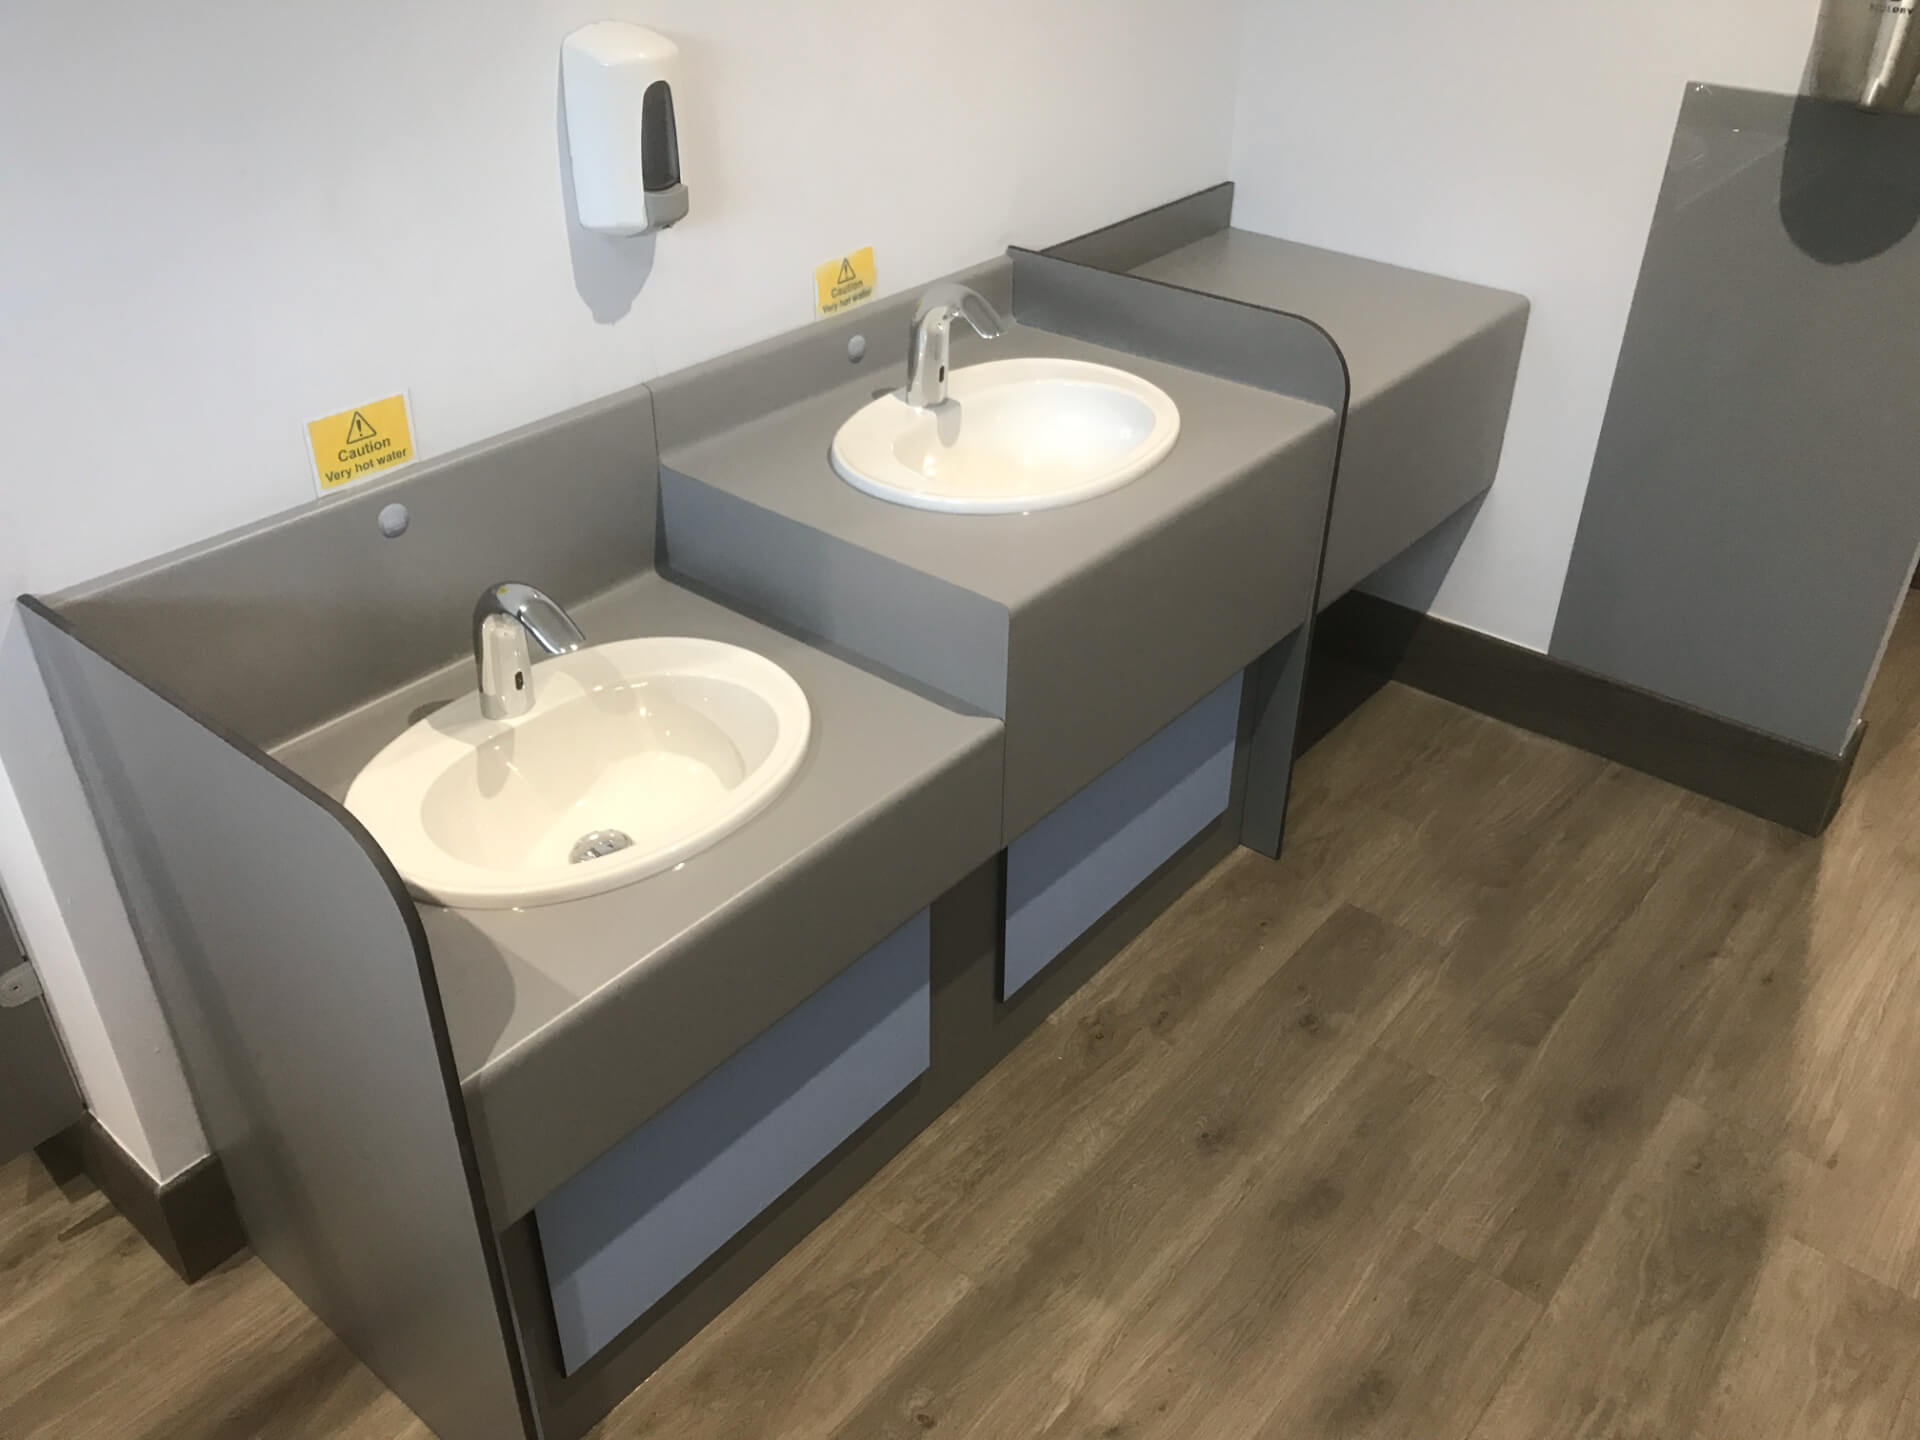 New Bathroom Sink Units